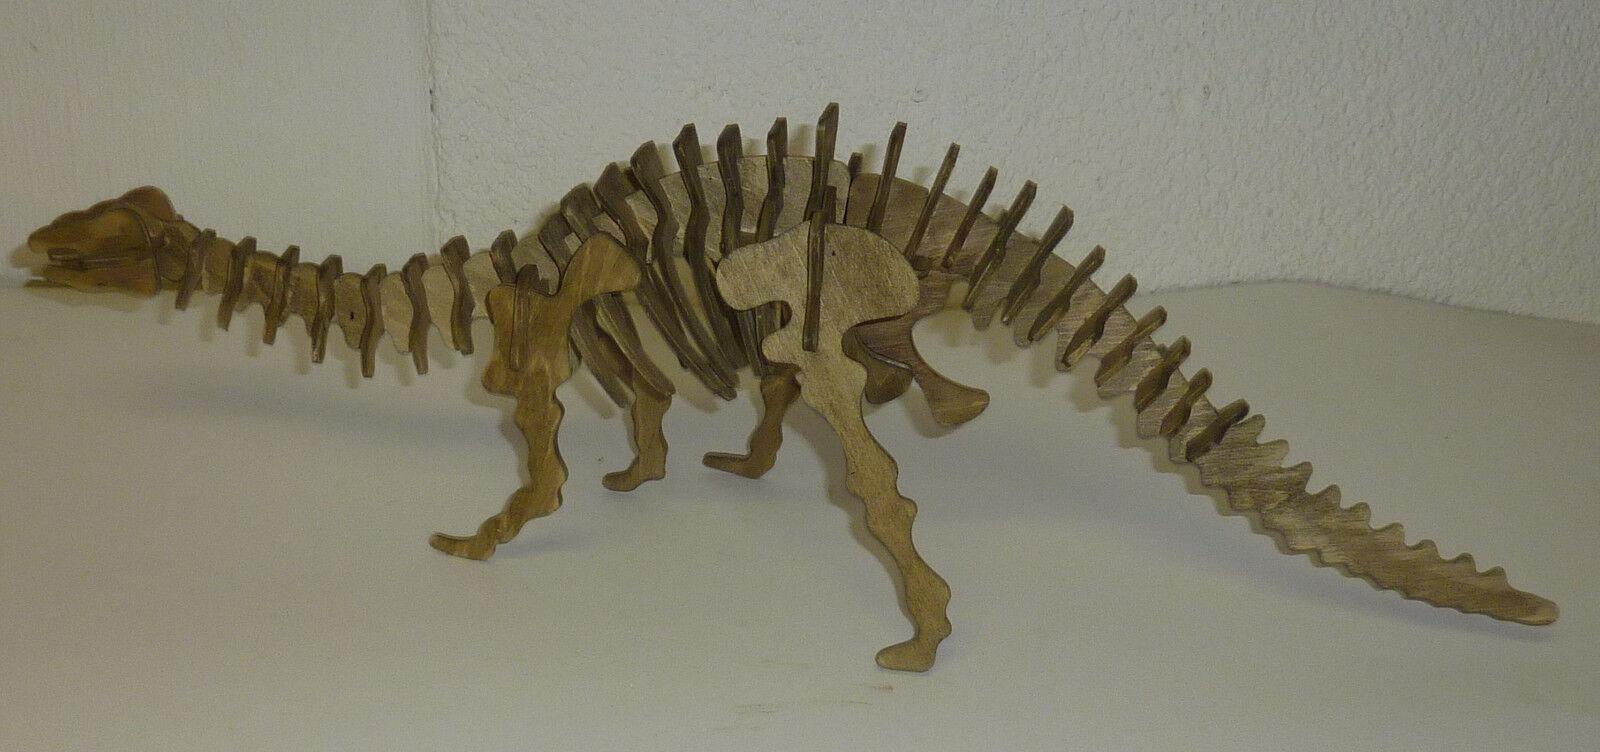 Dinosaurier Dinosaurier Dinosaurier aus Holz gefertigt & handbemalt Breite 50 cm Modell Spielzeug 3d505f